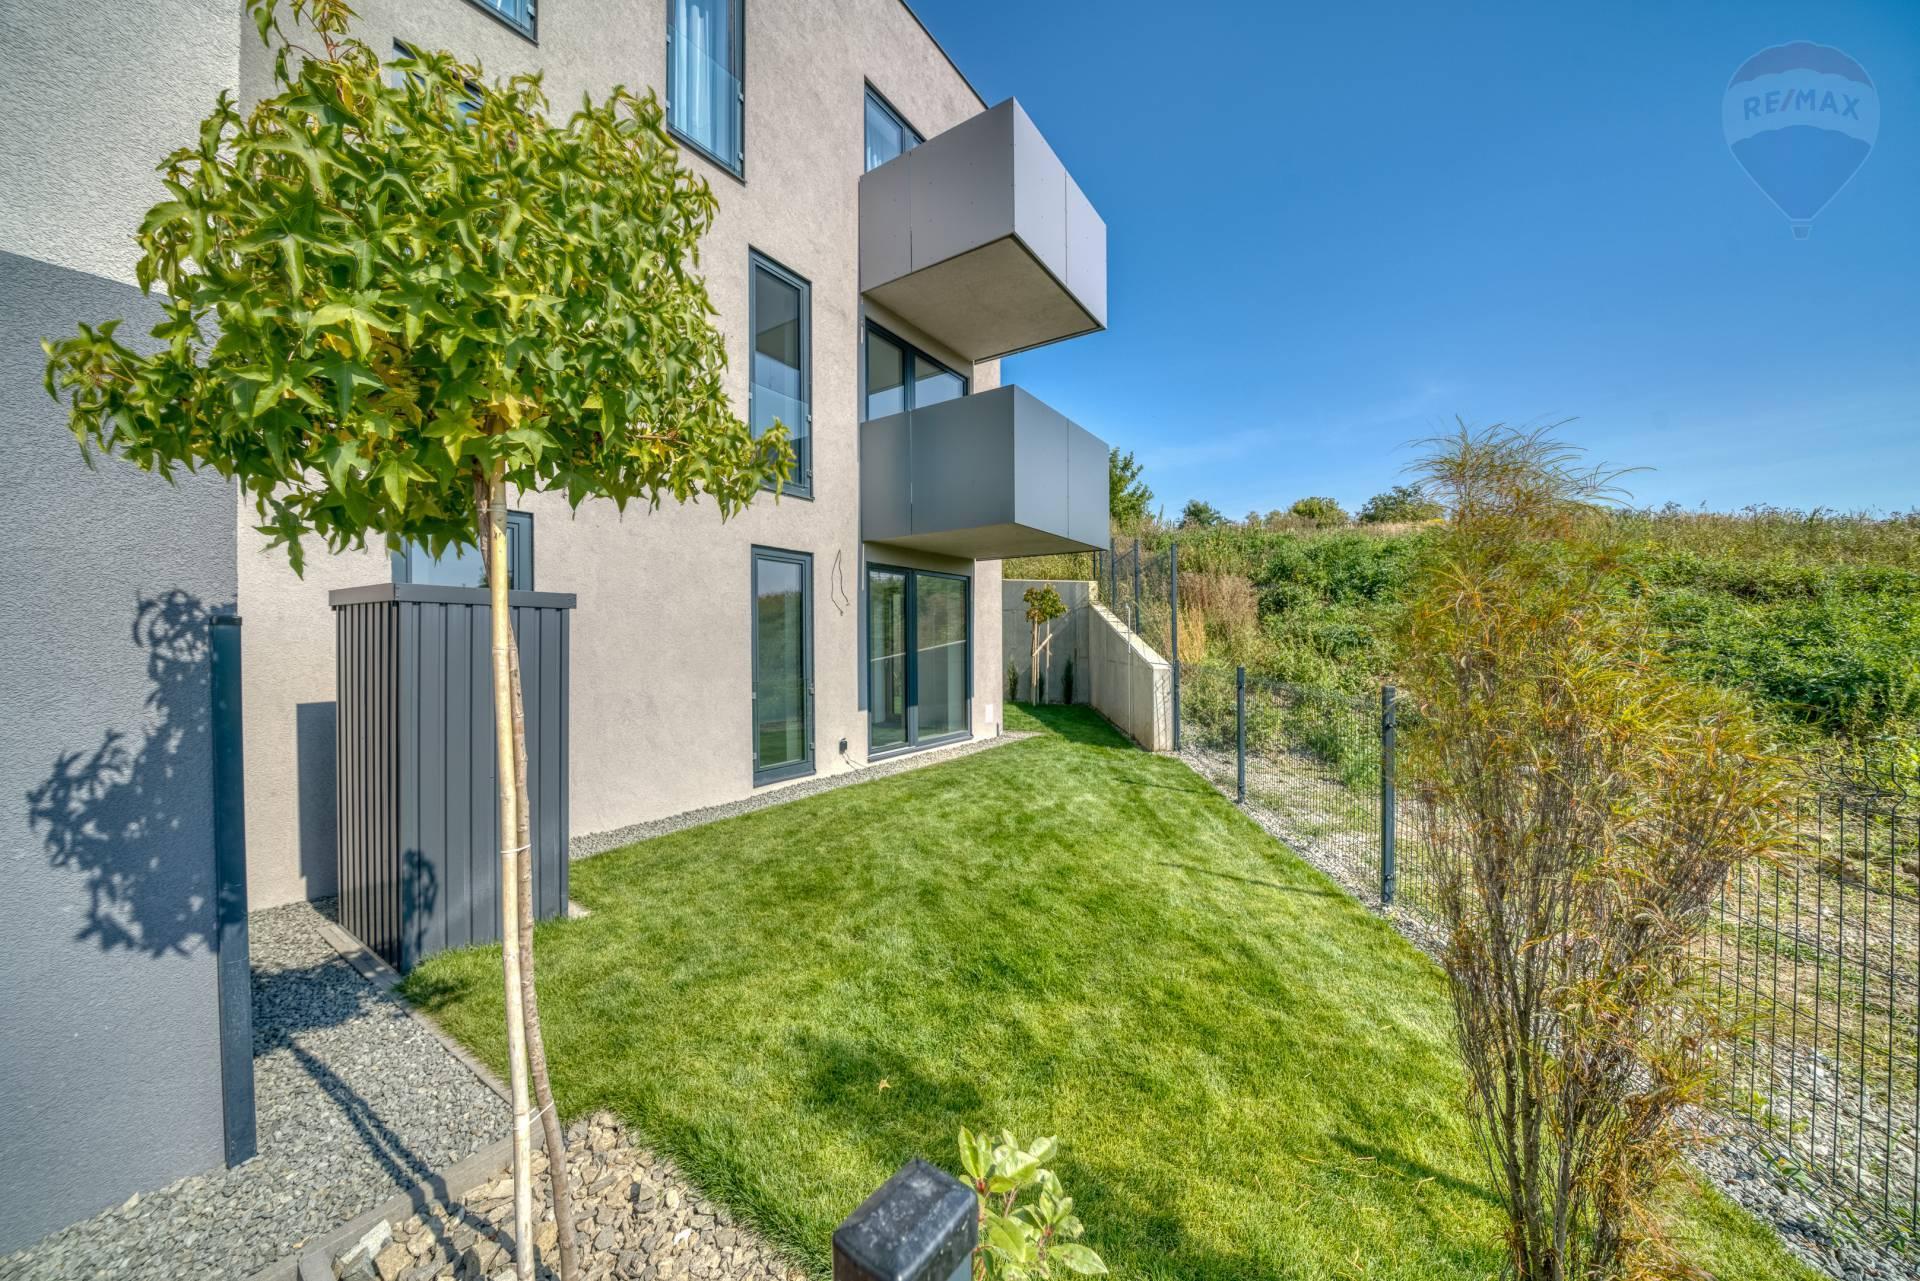 3 izbový byt na predaj, novostavba, projekt Viladomy Ľubotice